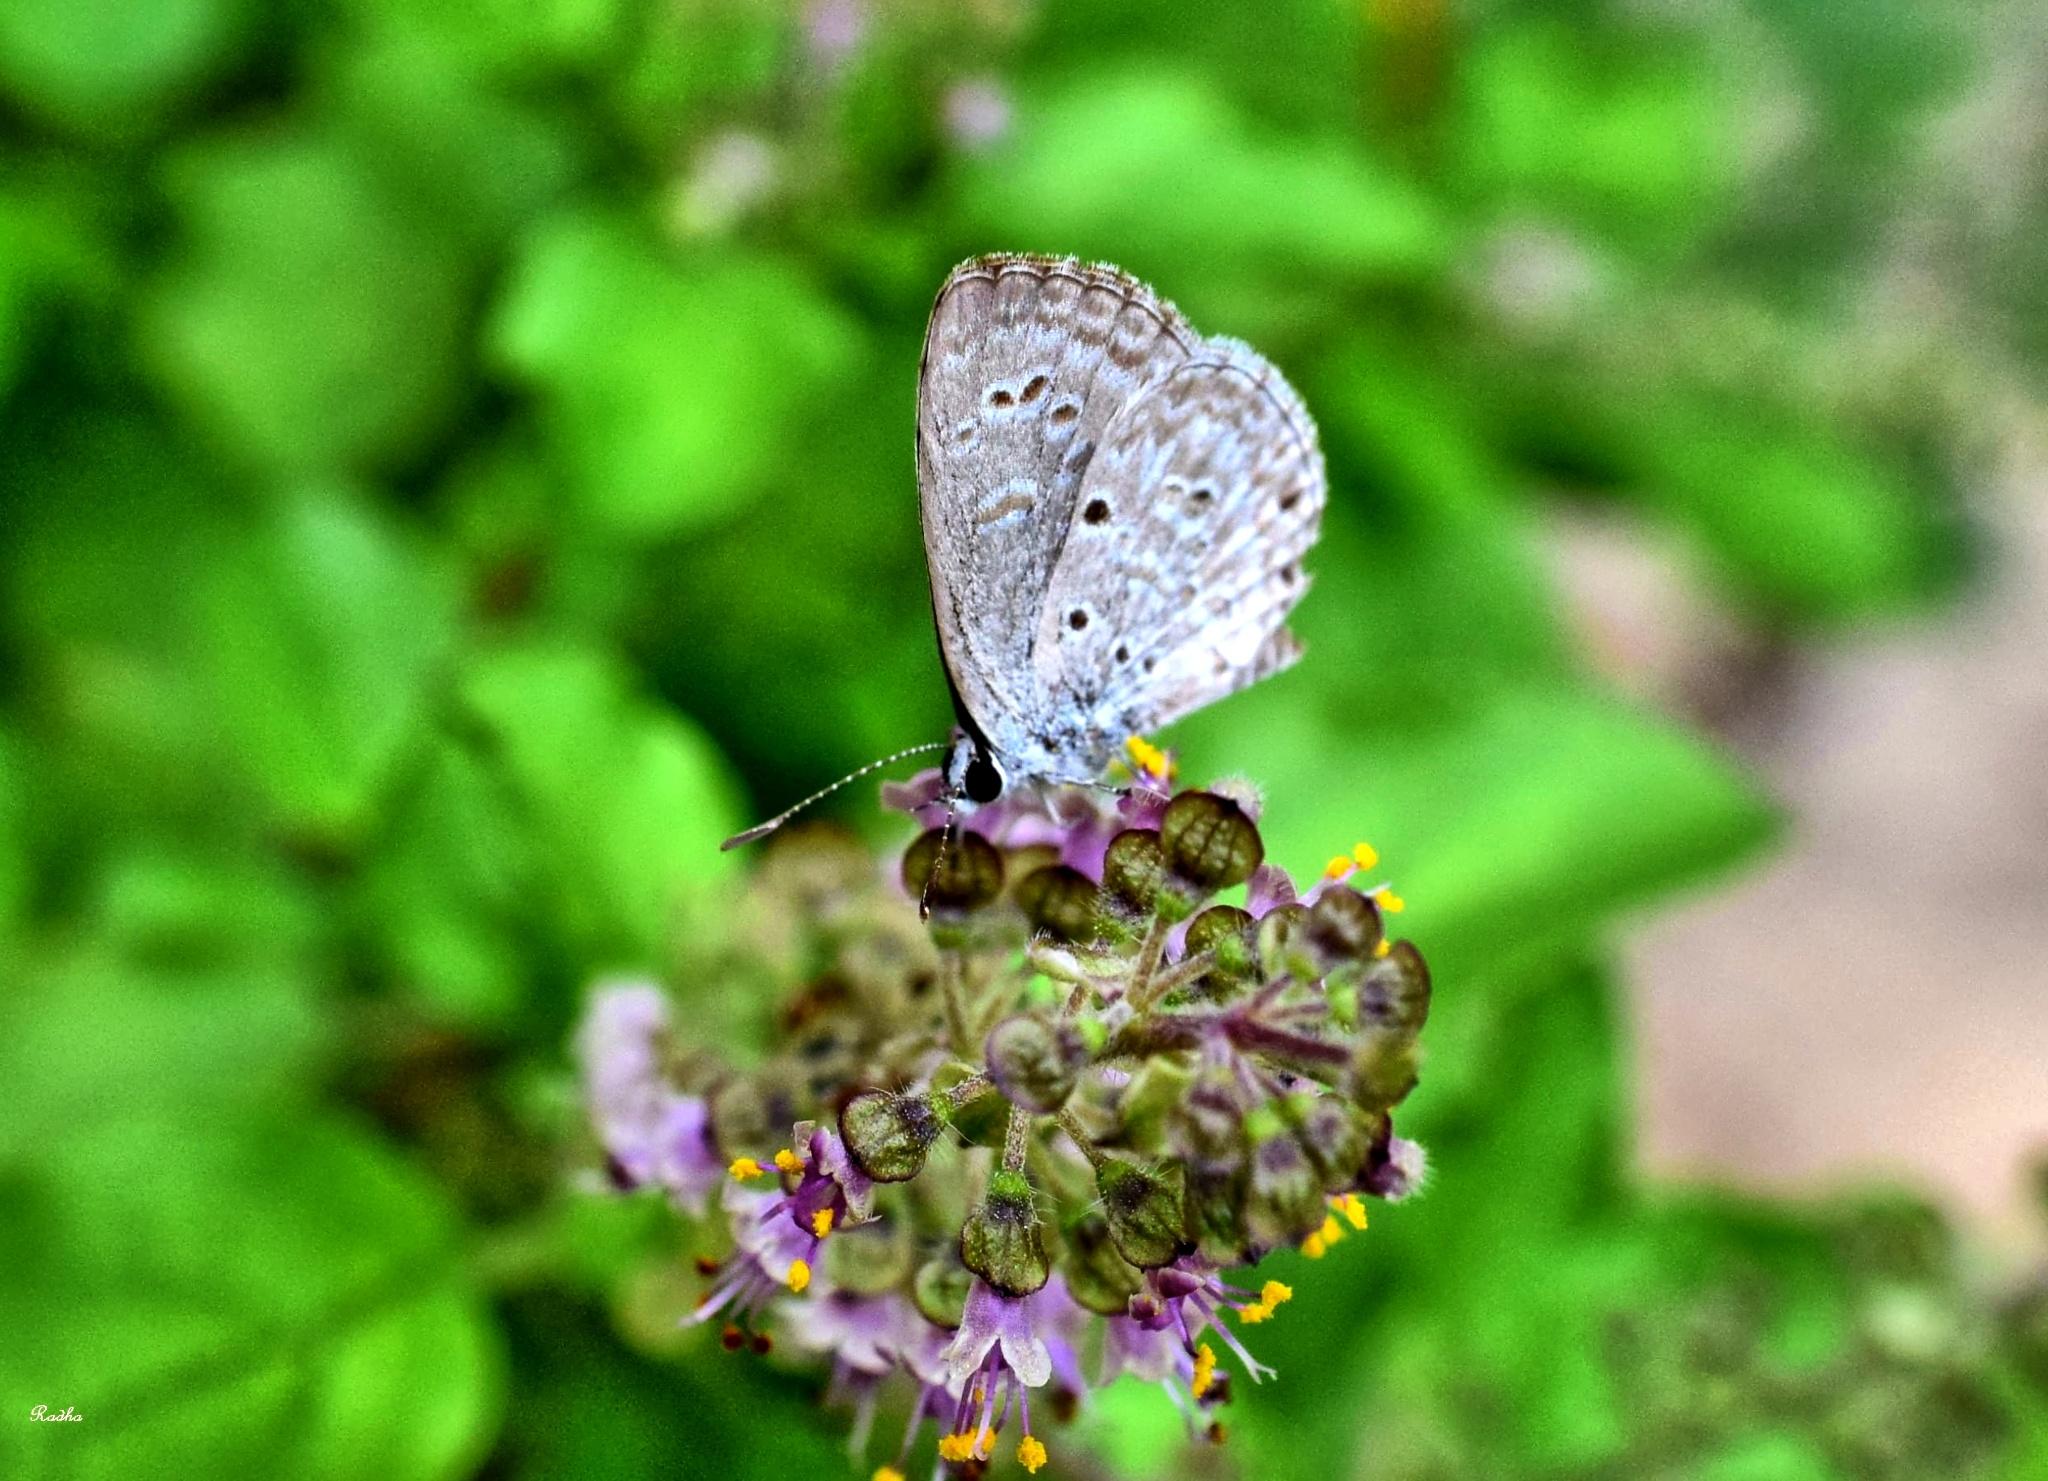 Moth on Holy Basil flower by Radhamadhavan K S